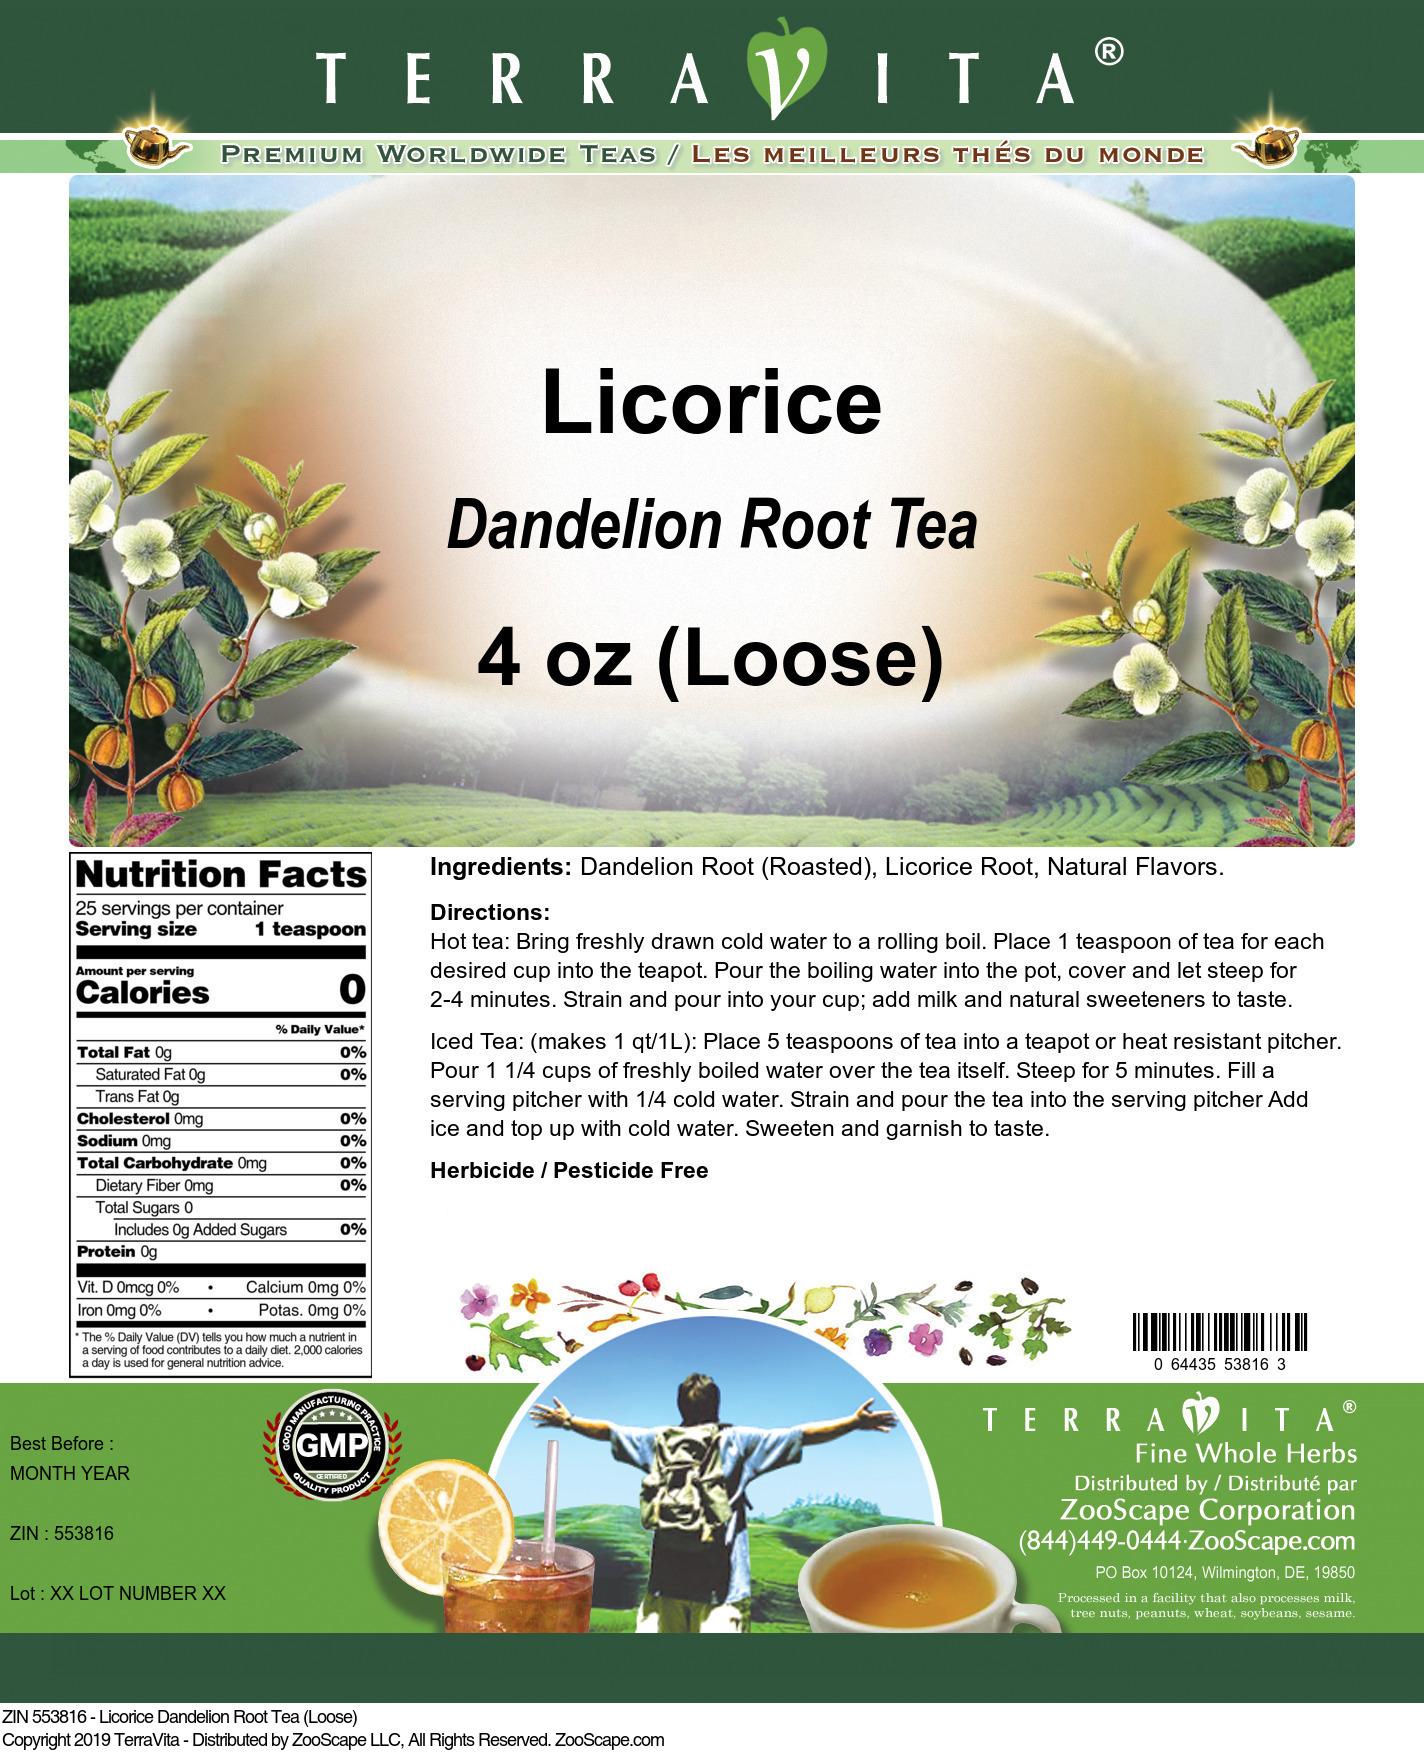 Licorice Dandelion Root Tea (Loose)